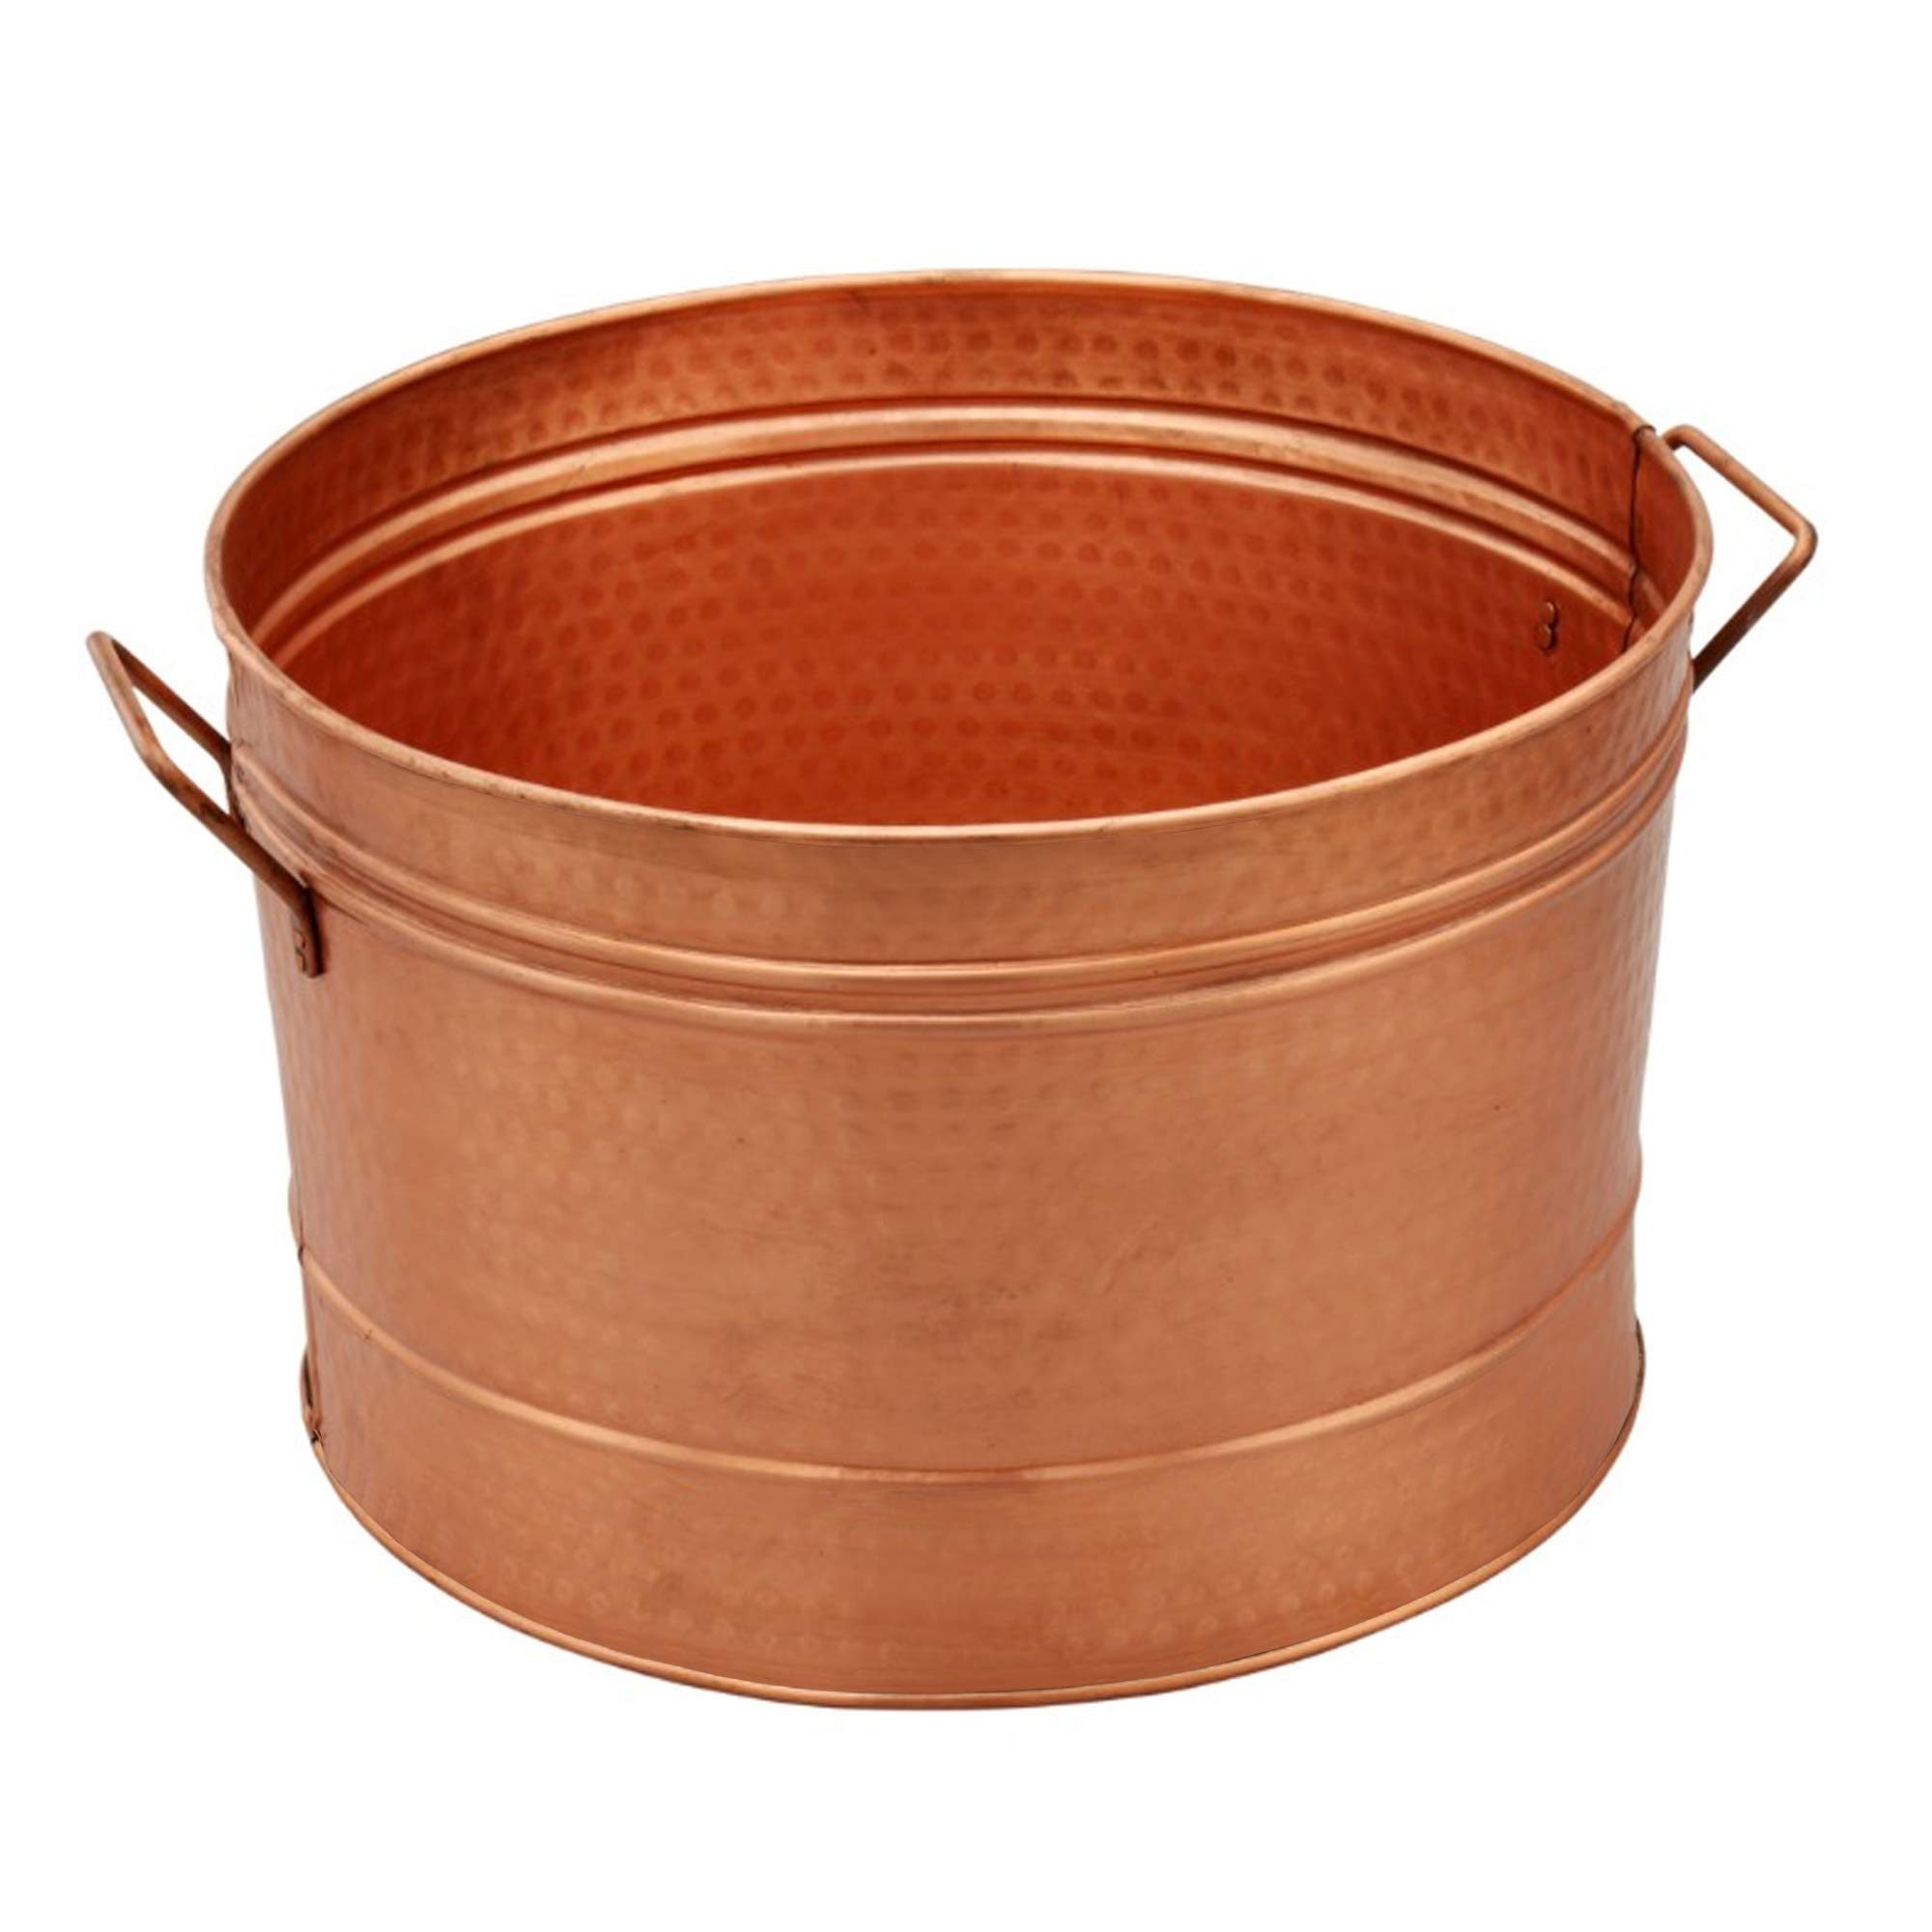 Benzara HGM008 Hammered Pattern Galvanized Farmhouse Style Tub, Copper by Benzara